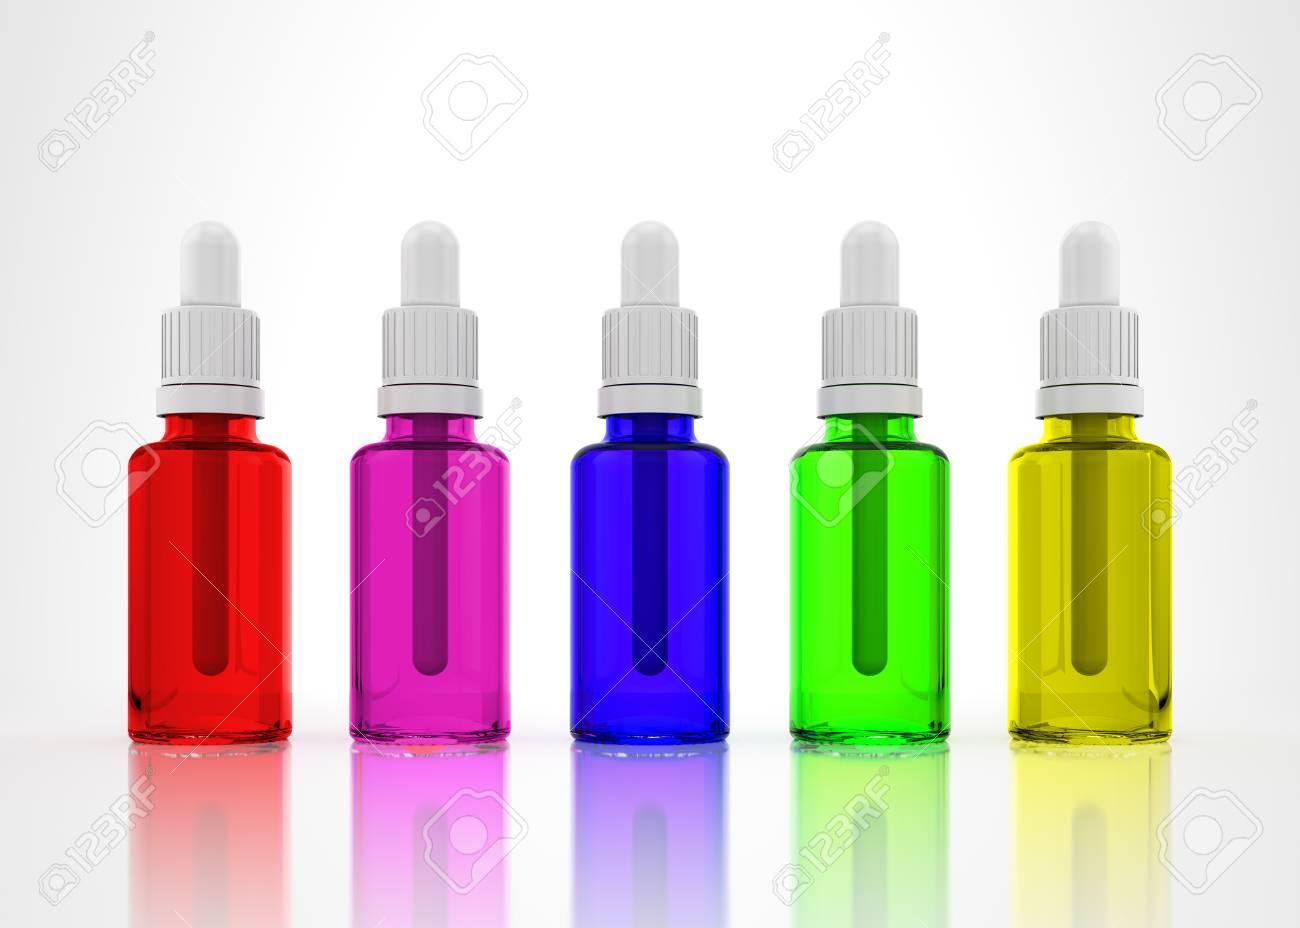 Eye Dropper Bottle Isolated on a white background Stock Photo - 23300217